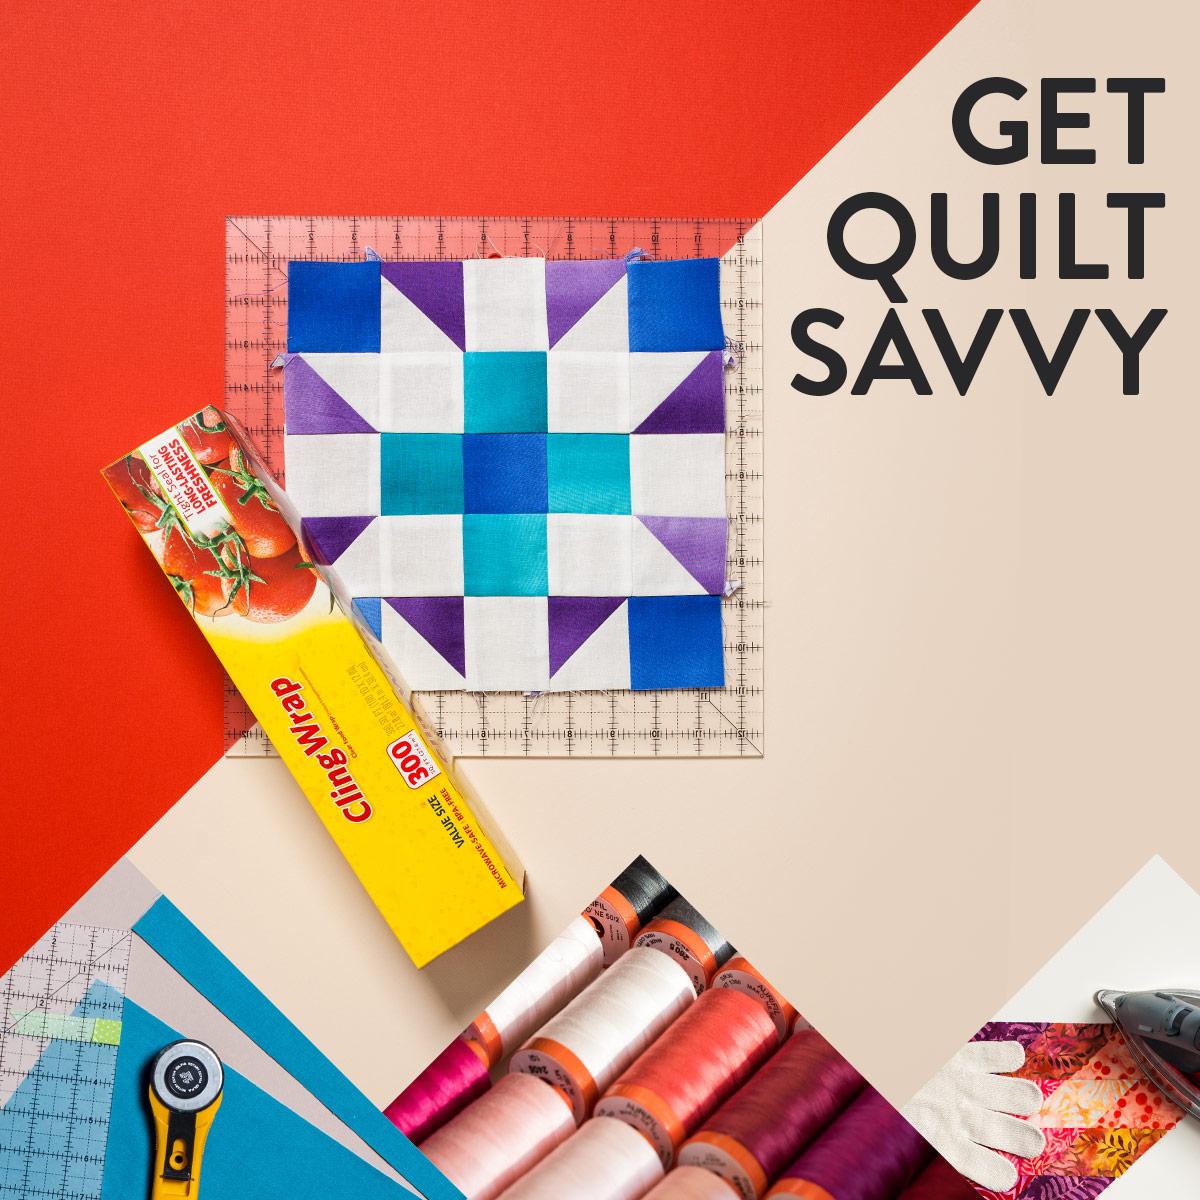 Get Quilt Savvy